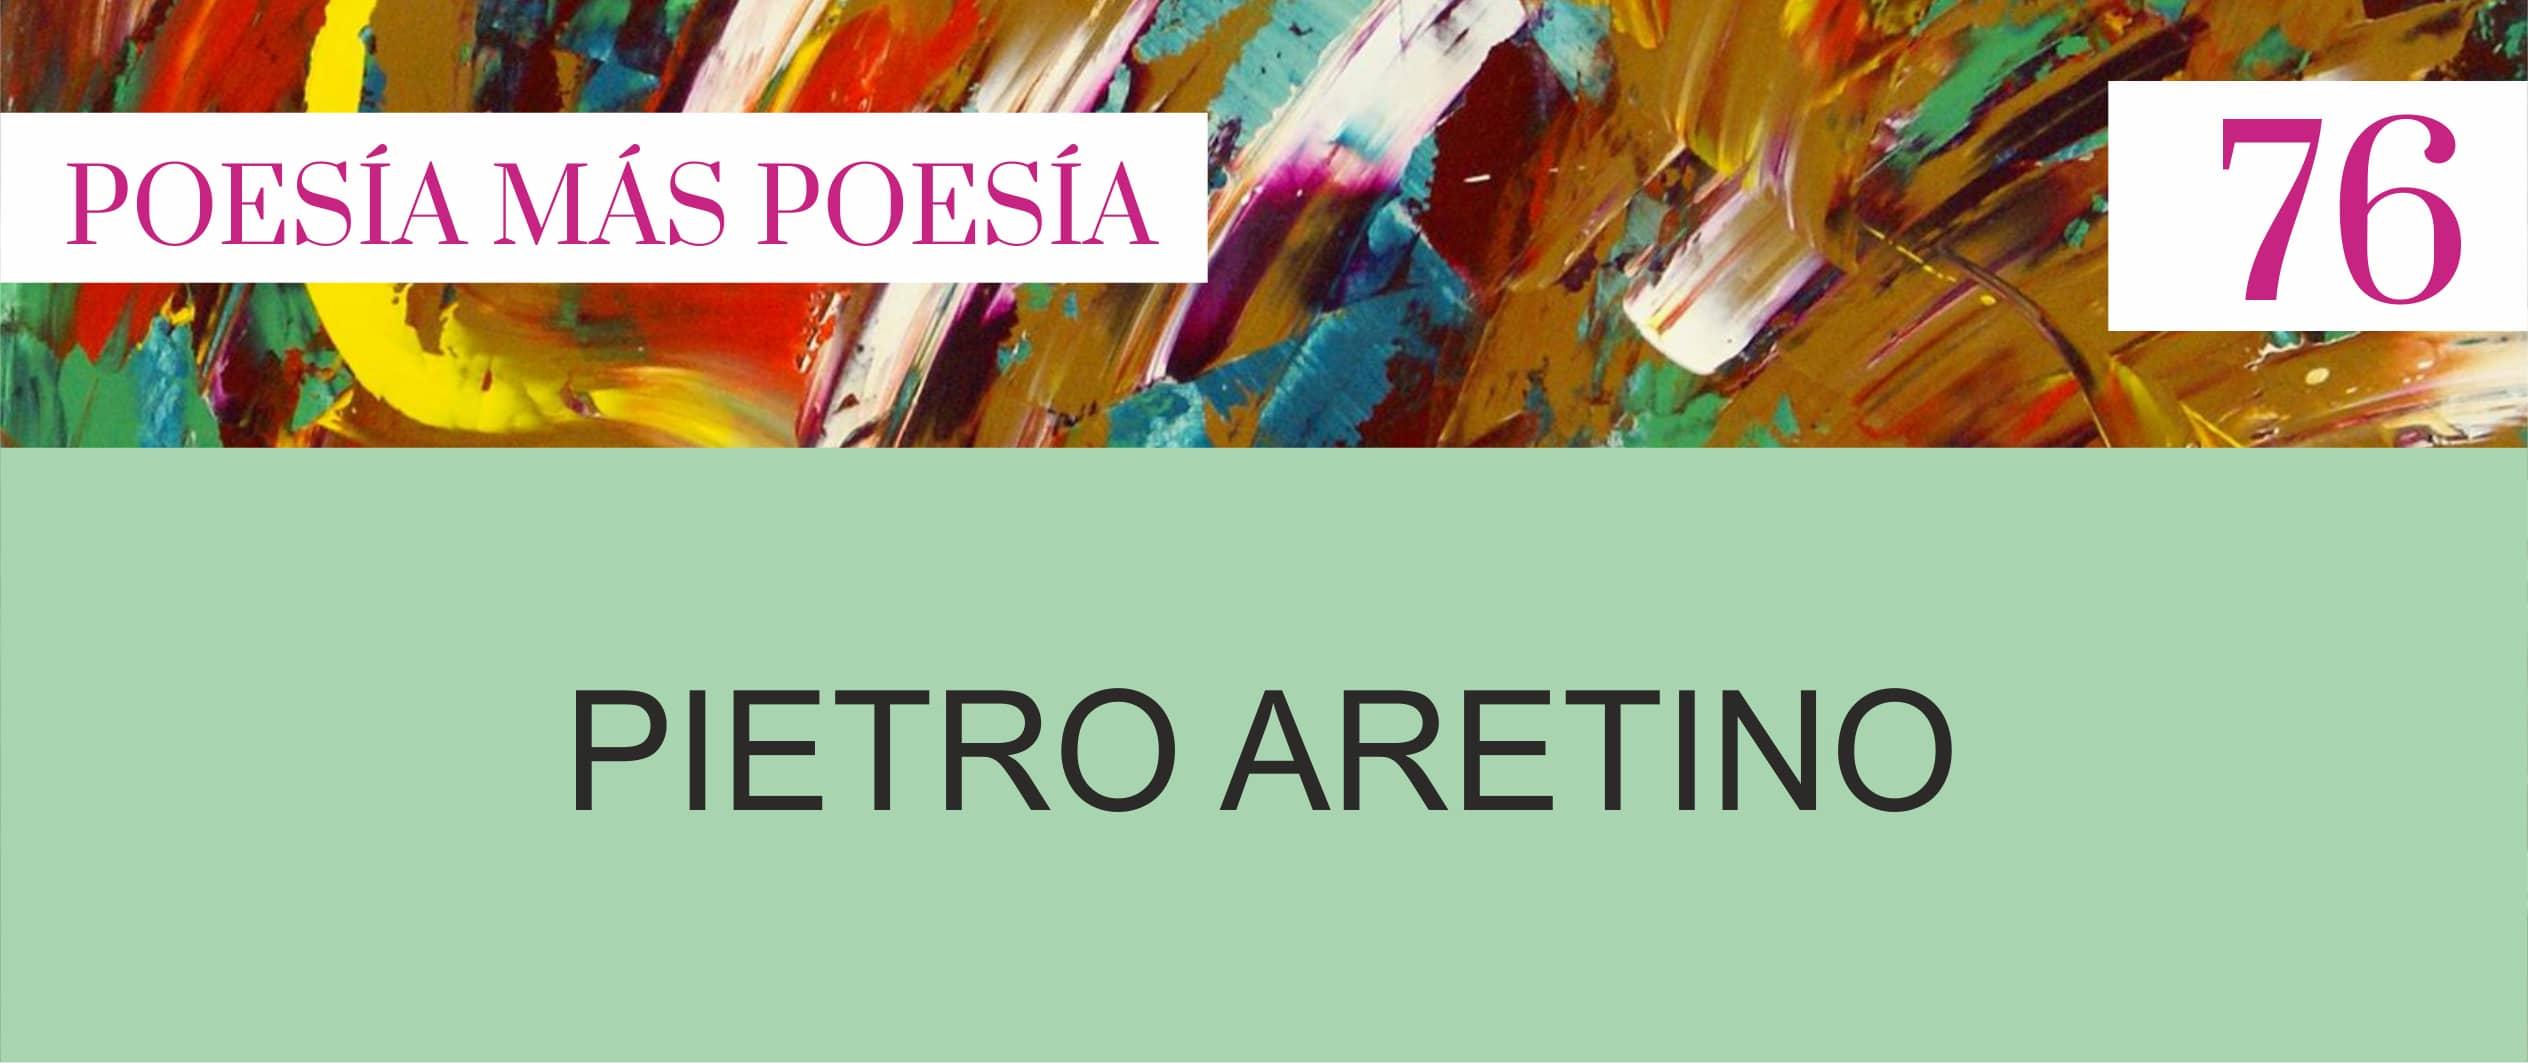 pietro Webp.net compress image - Poesia Online